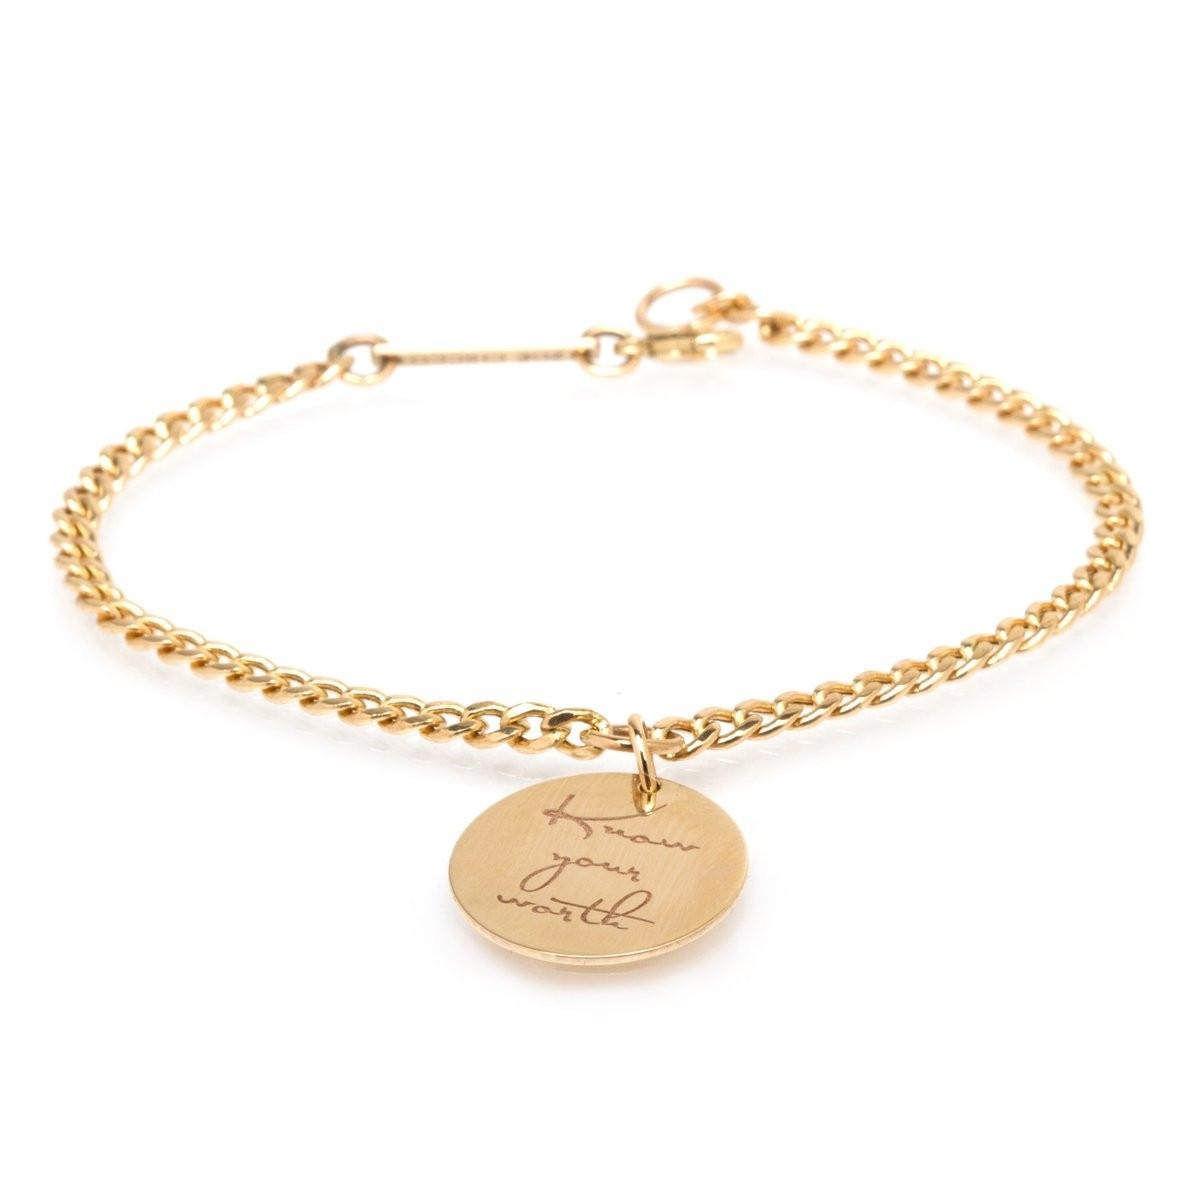 "Zoë Chicco Small Mantra Charm Bracelet ""Know your worth"""